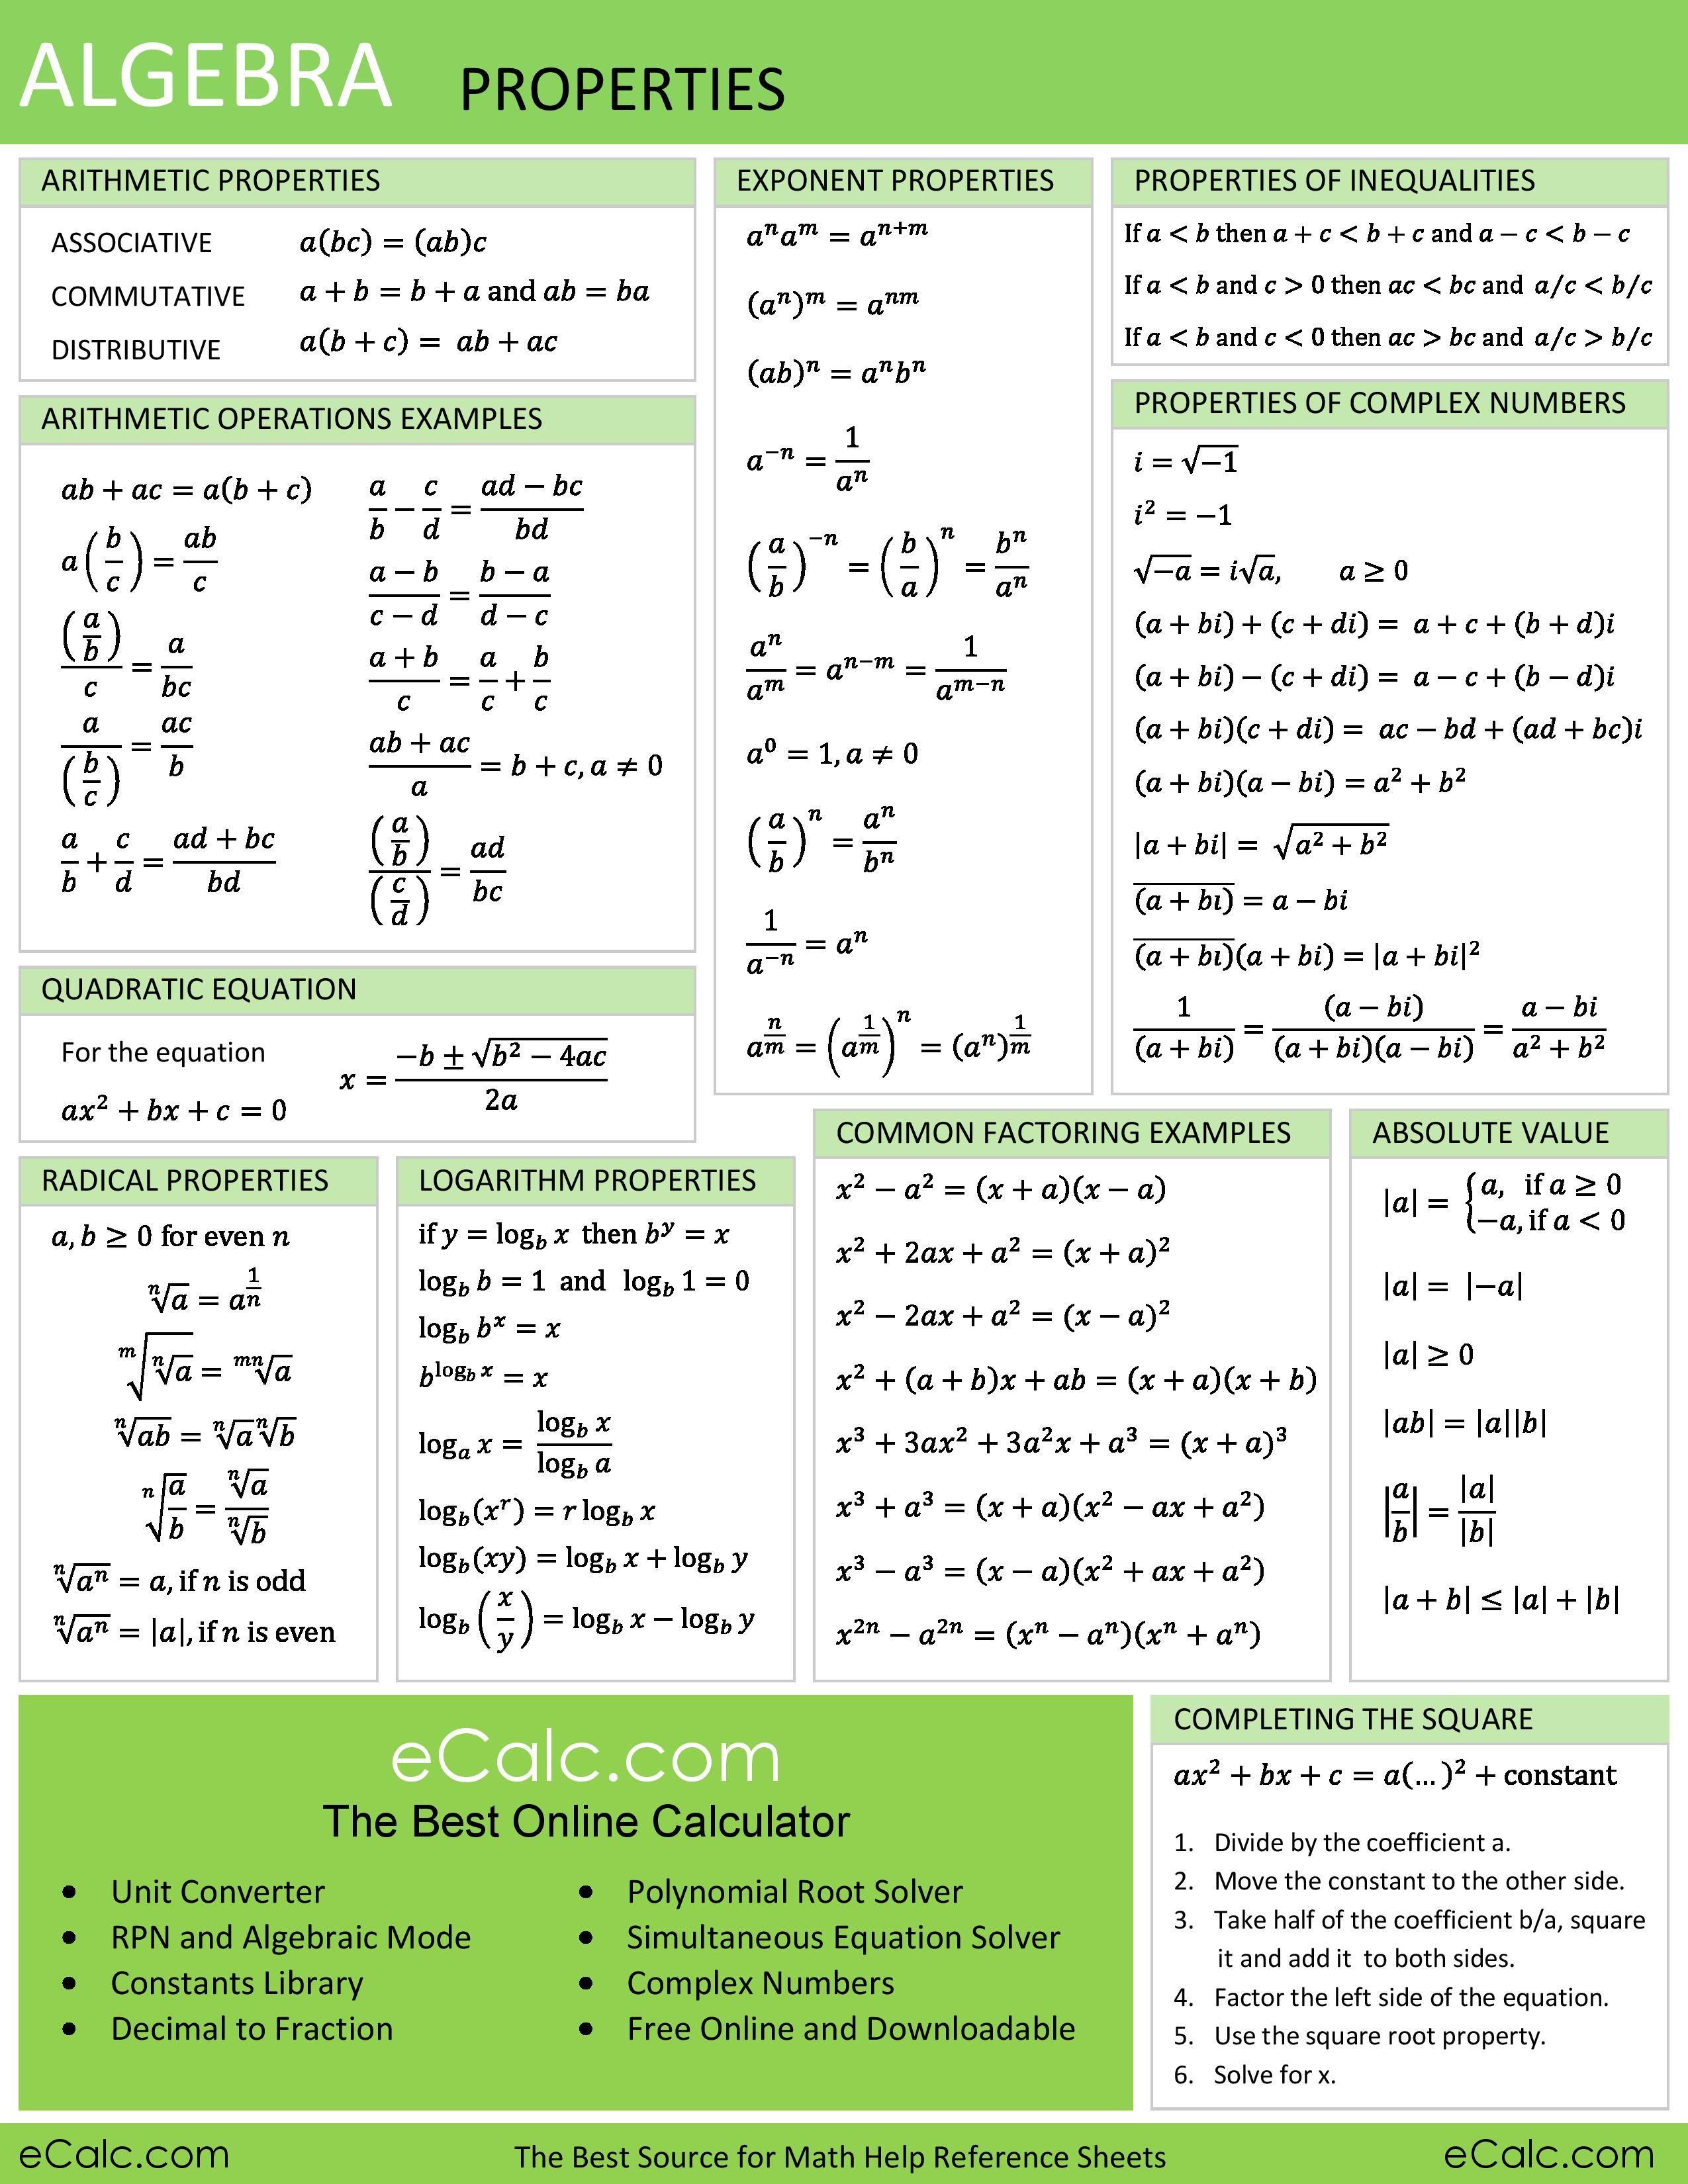 Algebra Properties Ecalc S Math Help Reference Sheet Math Methods Algebra Formulas College Algebra [ 3300 x 2550 Pixel ]